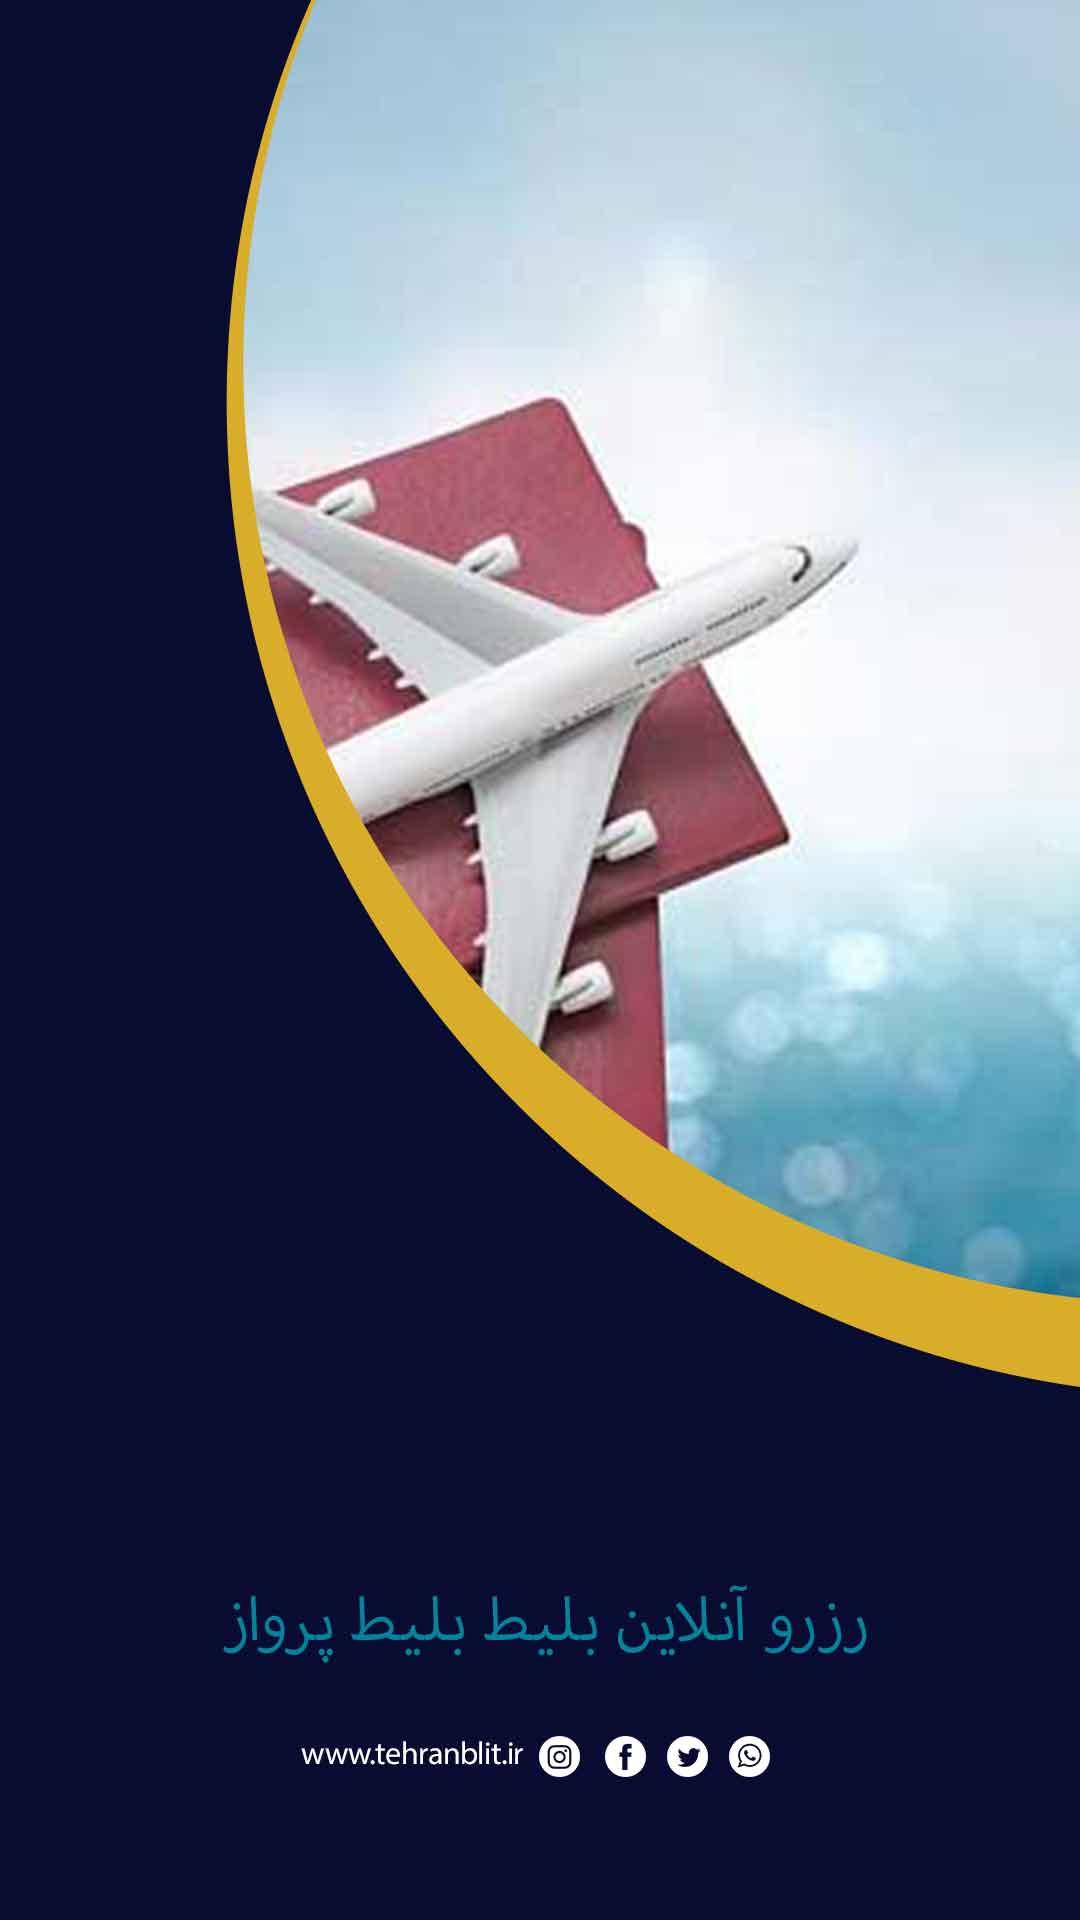 بلیط پرواز تبریز به مشهد